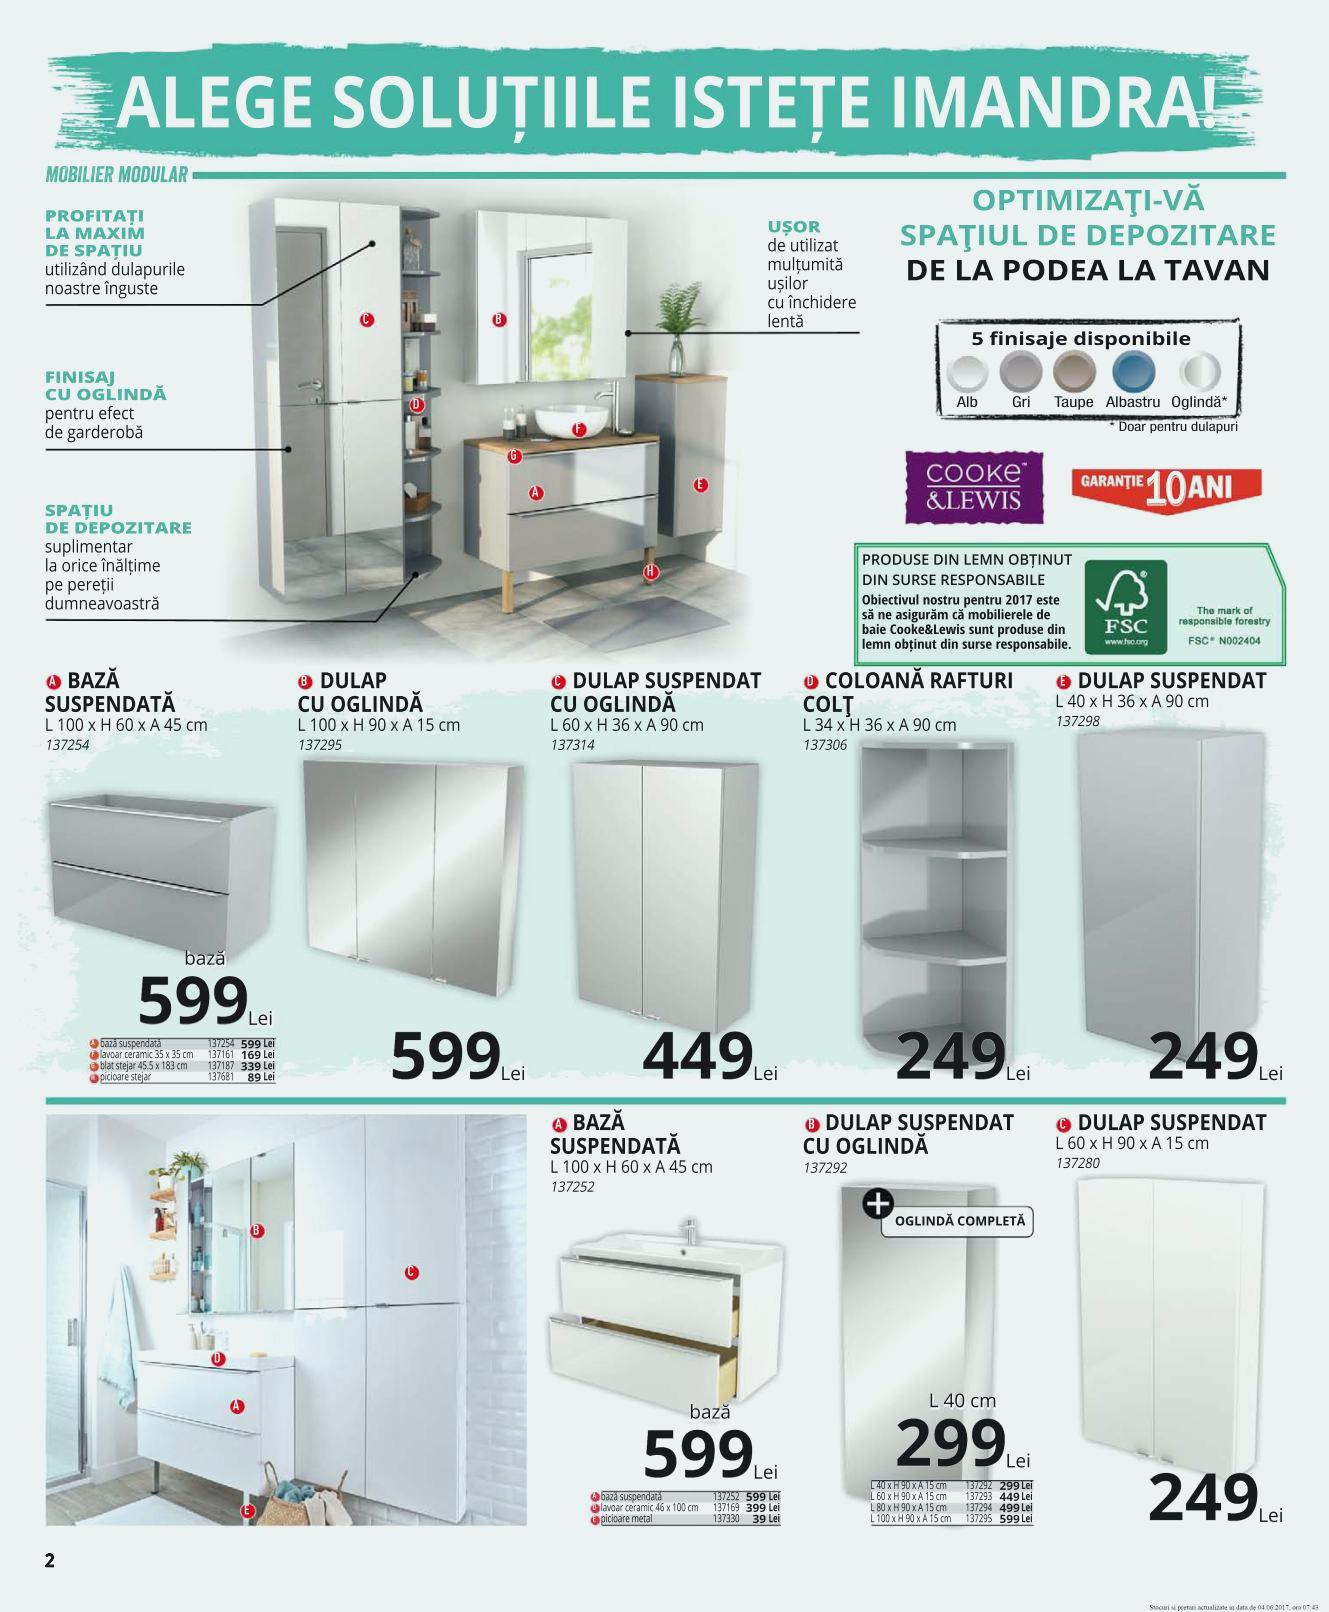 Veranda Brico Depot Unique Image 40 Frais Brico Depot Abri De Jardin Conception De Cuisine